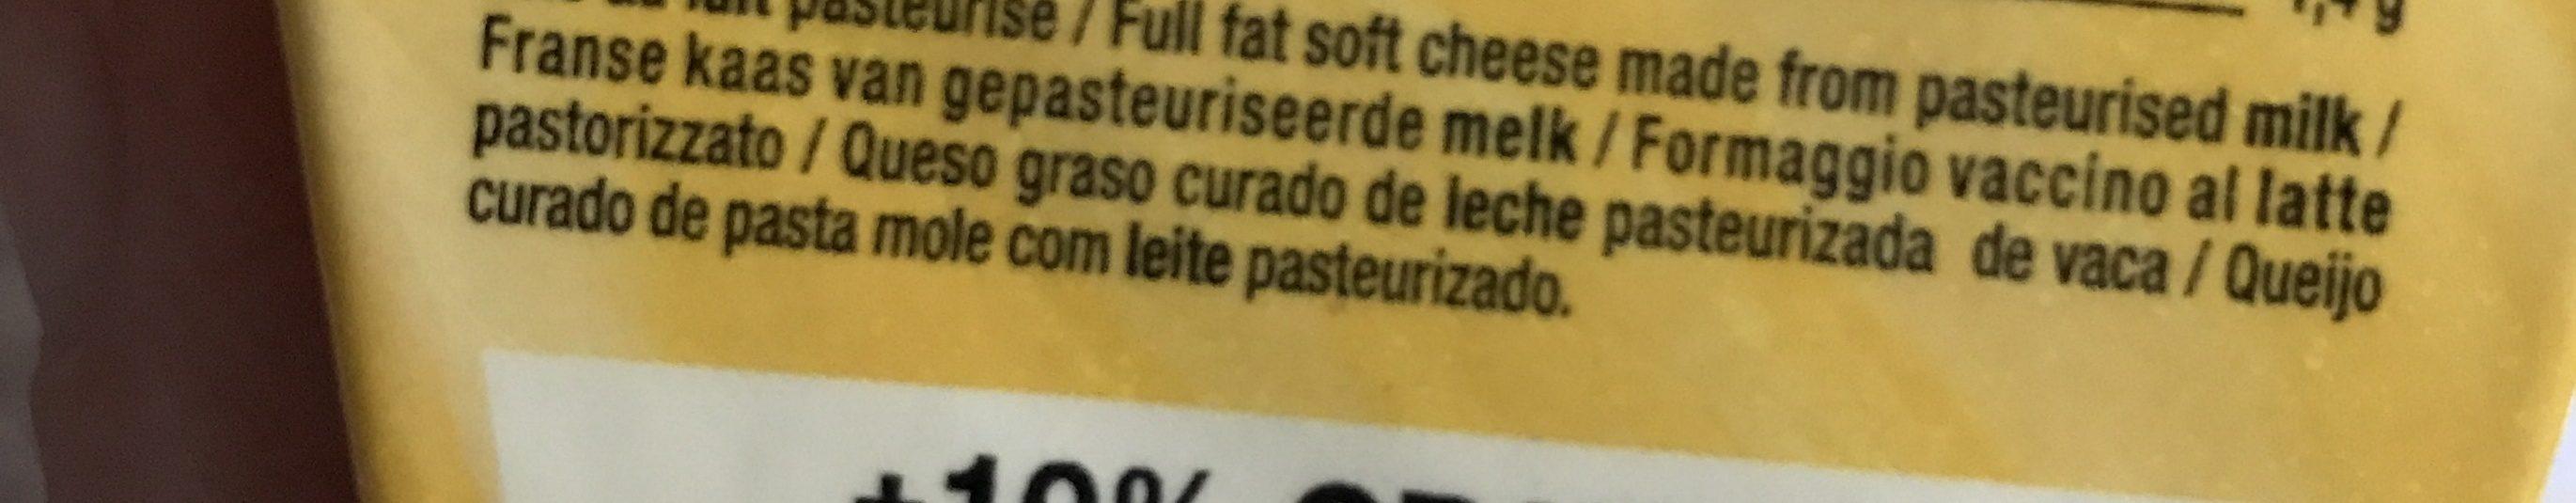 Coeur De Lion Pointe De Brie 200g +10% Gratuit - Ingrediënten